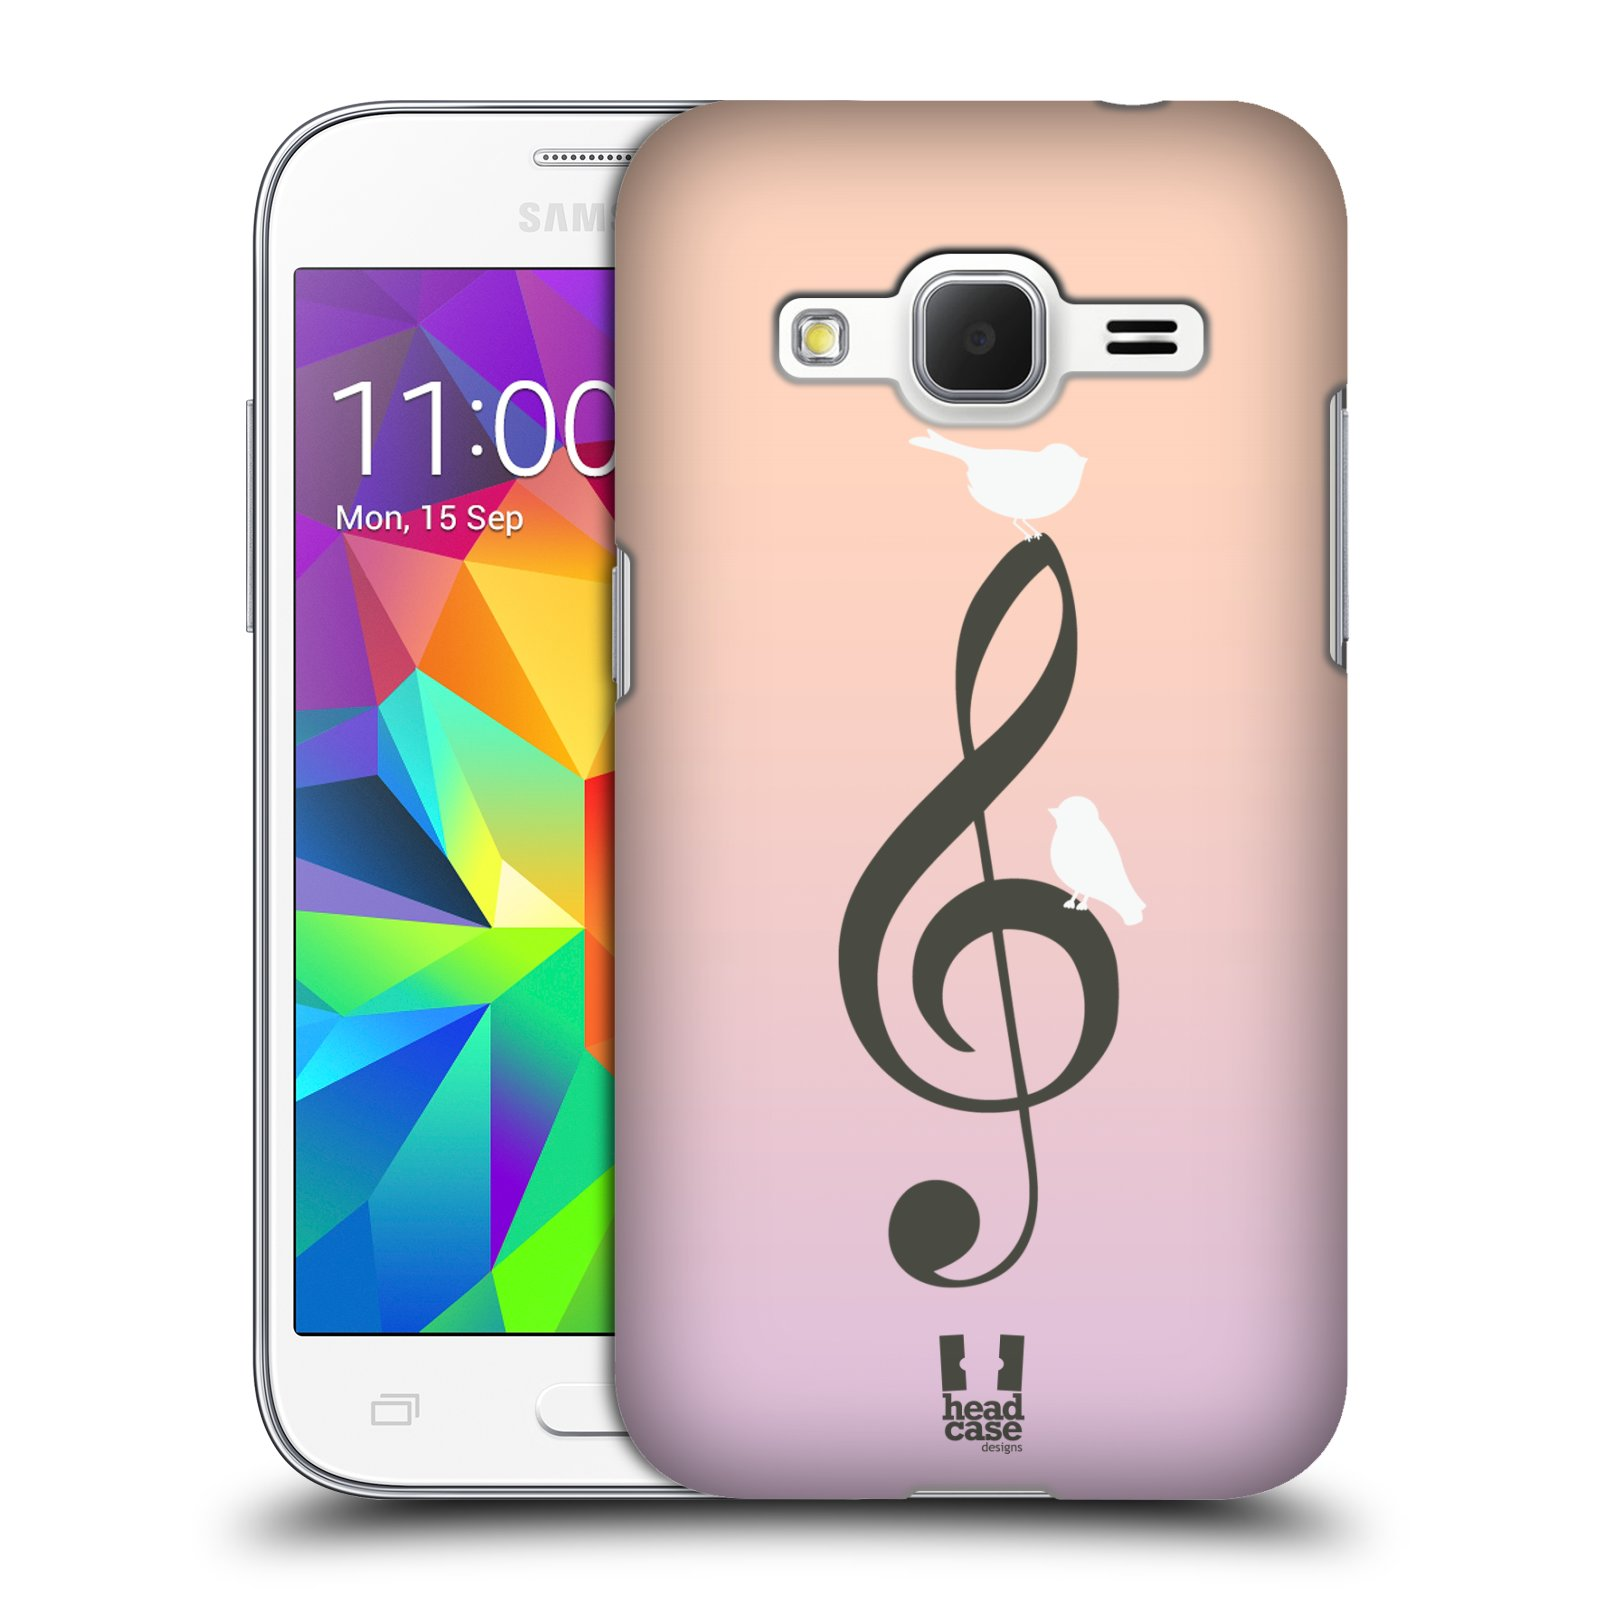 HEAD CASE plastový obal na mobil SAMSUNG GALAXY Core Prime (Core Prime VE) vzor Ptáček zpěváček noty nota